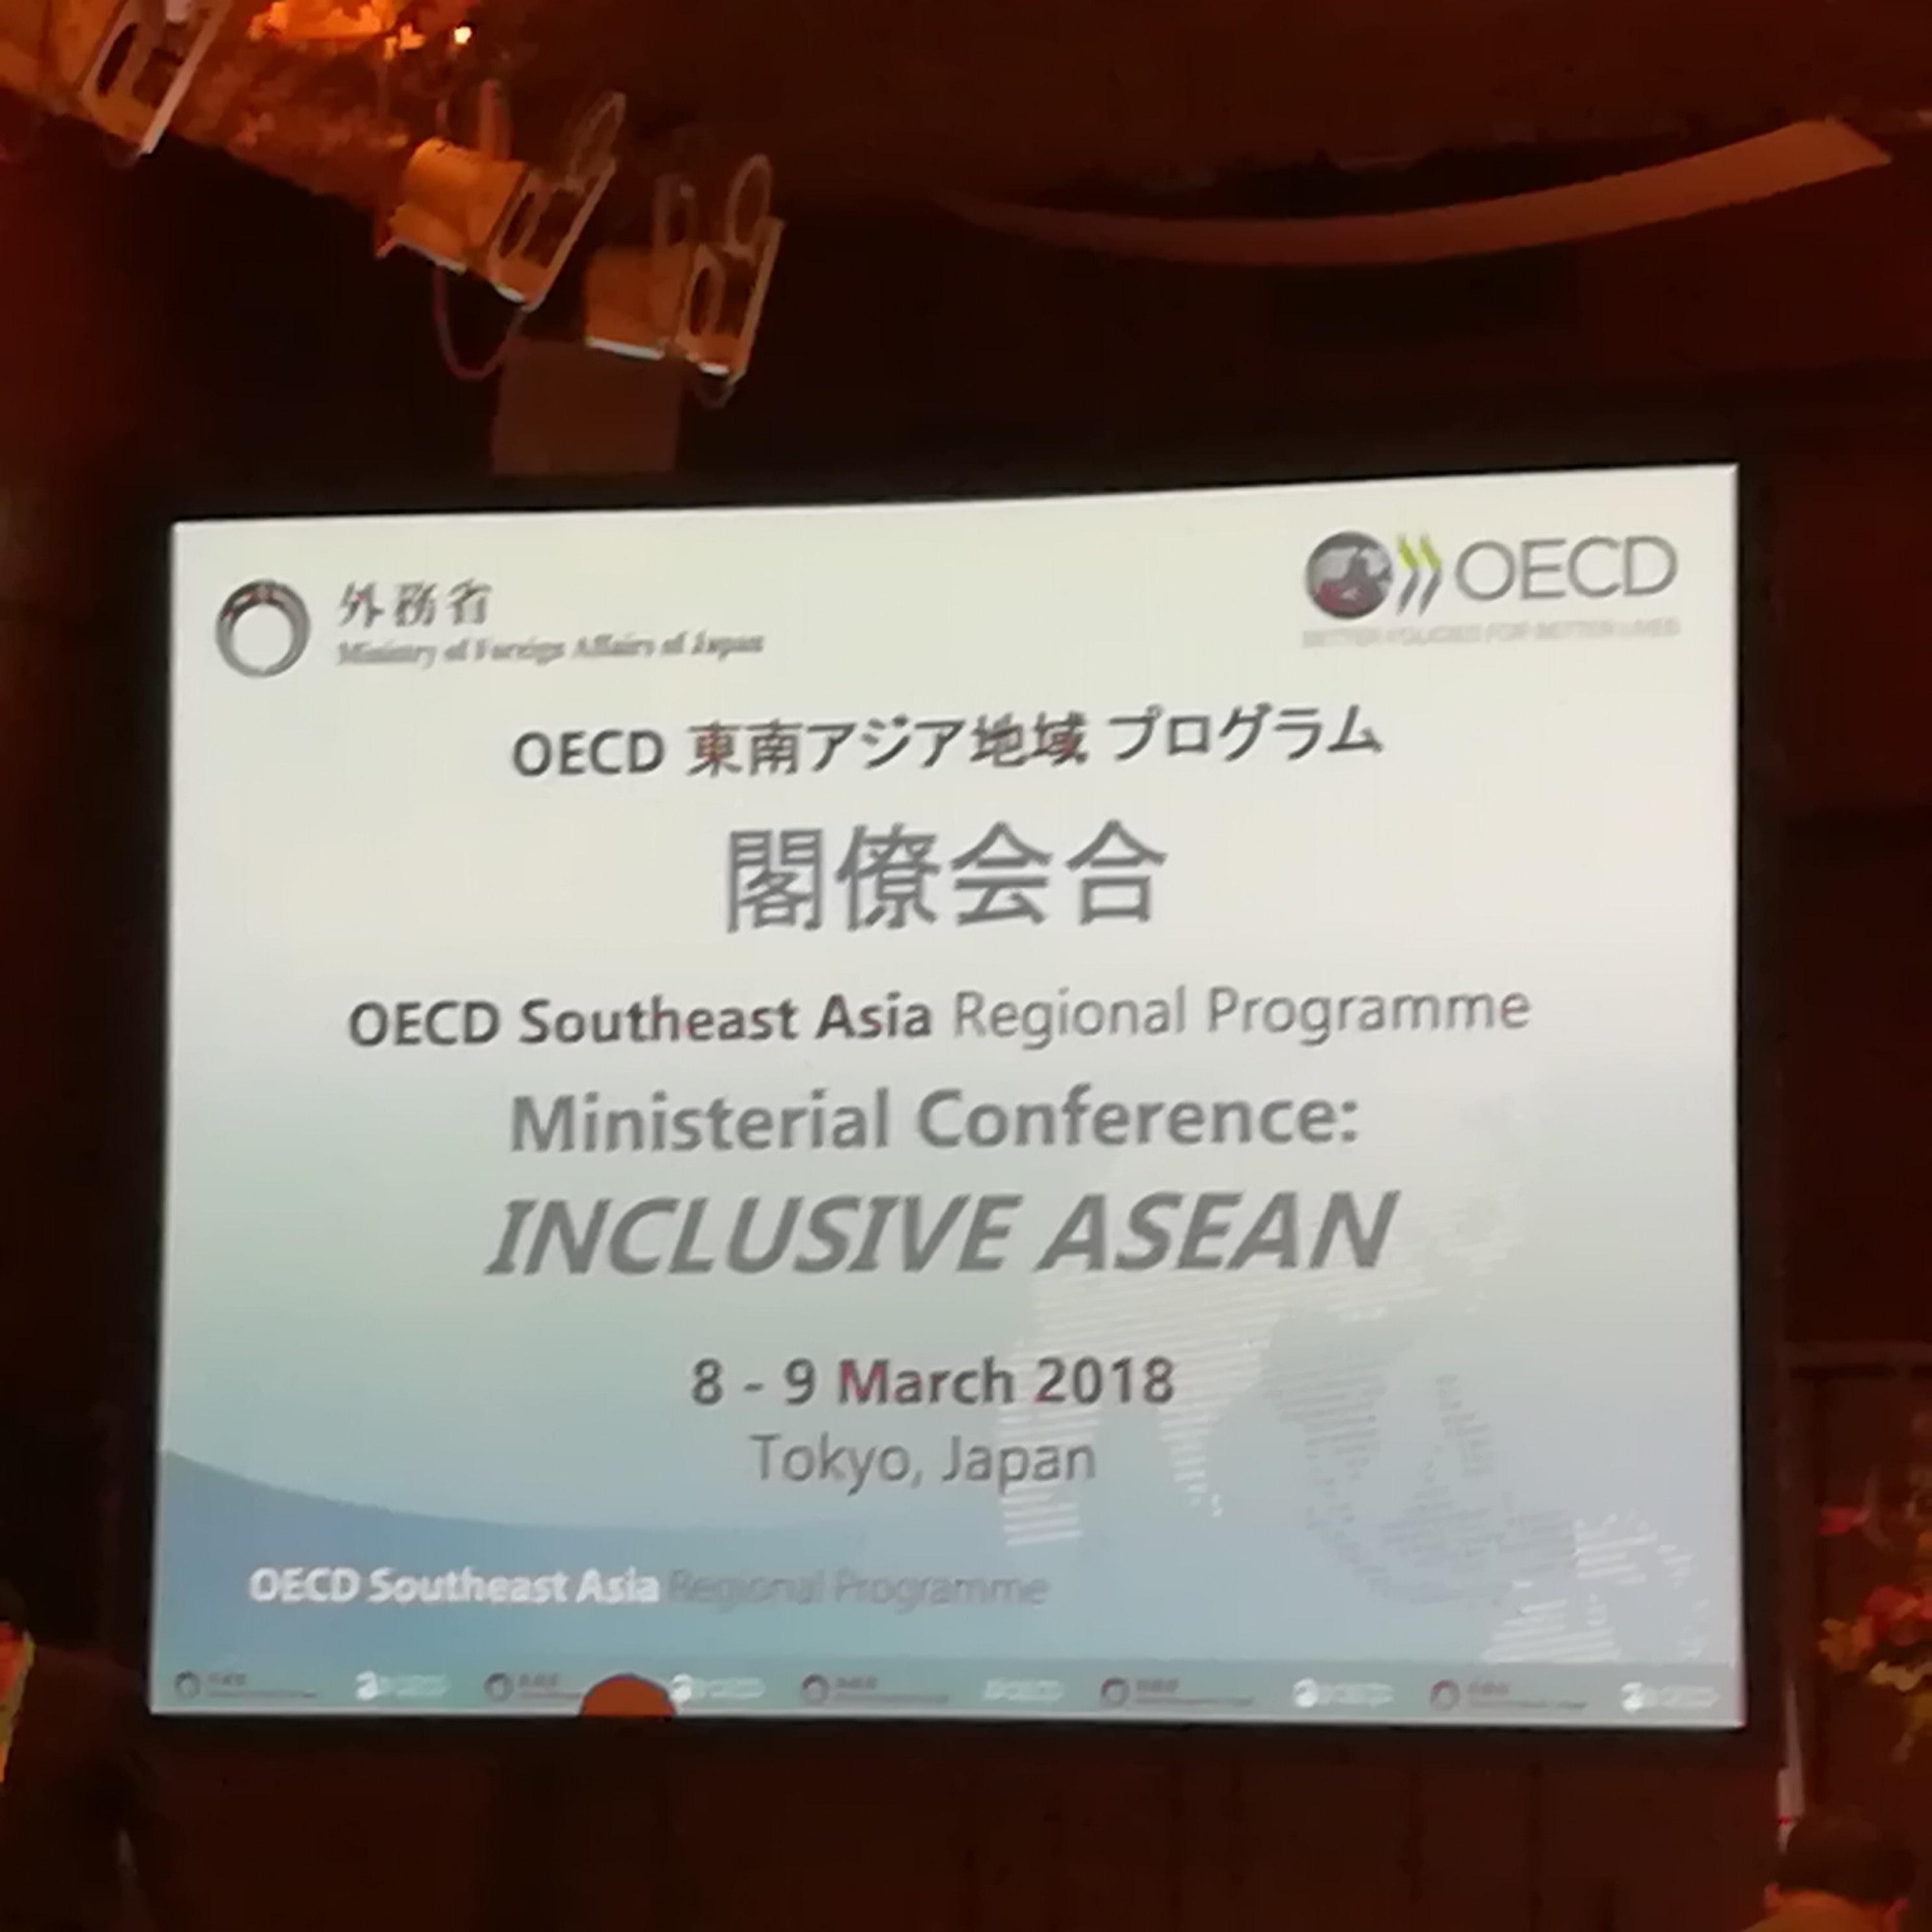 OECD東南アジア地域プログラム閣僚会合